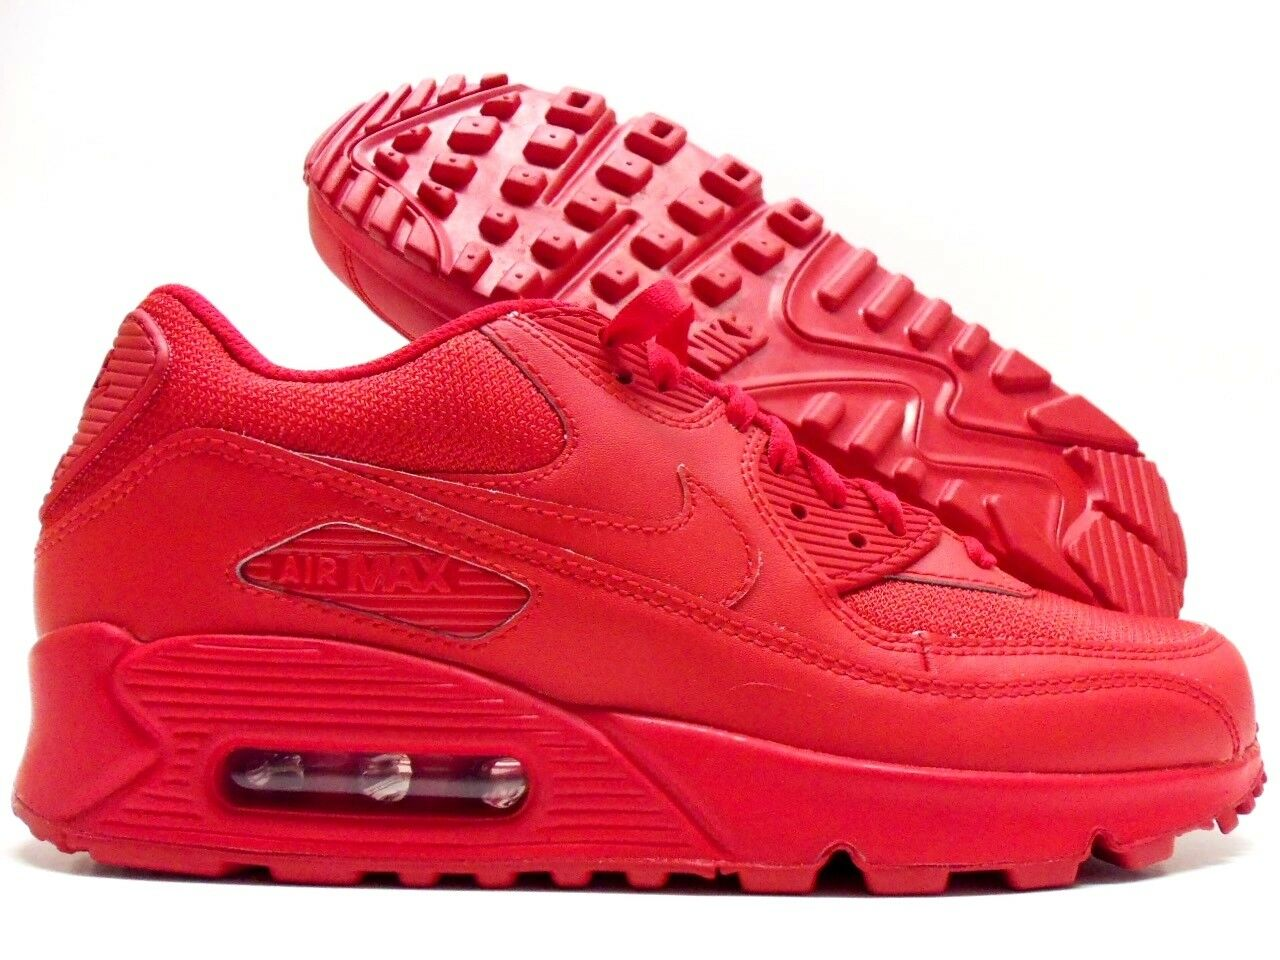 Nike air max 90 id / ottobre rosso / id bianco, rosso come sport maschile 12 844a5d